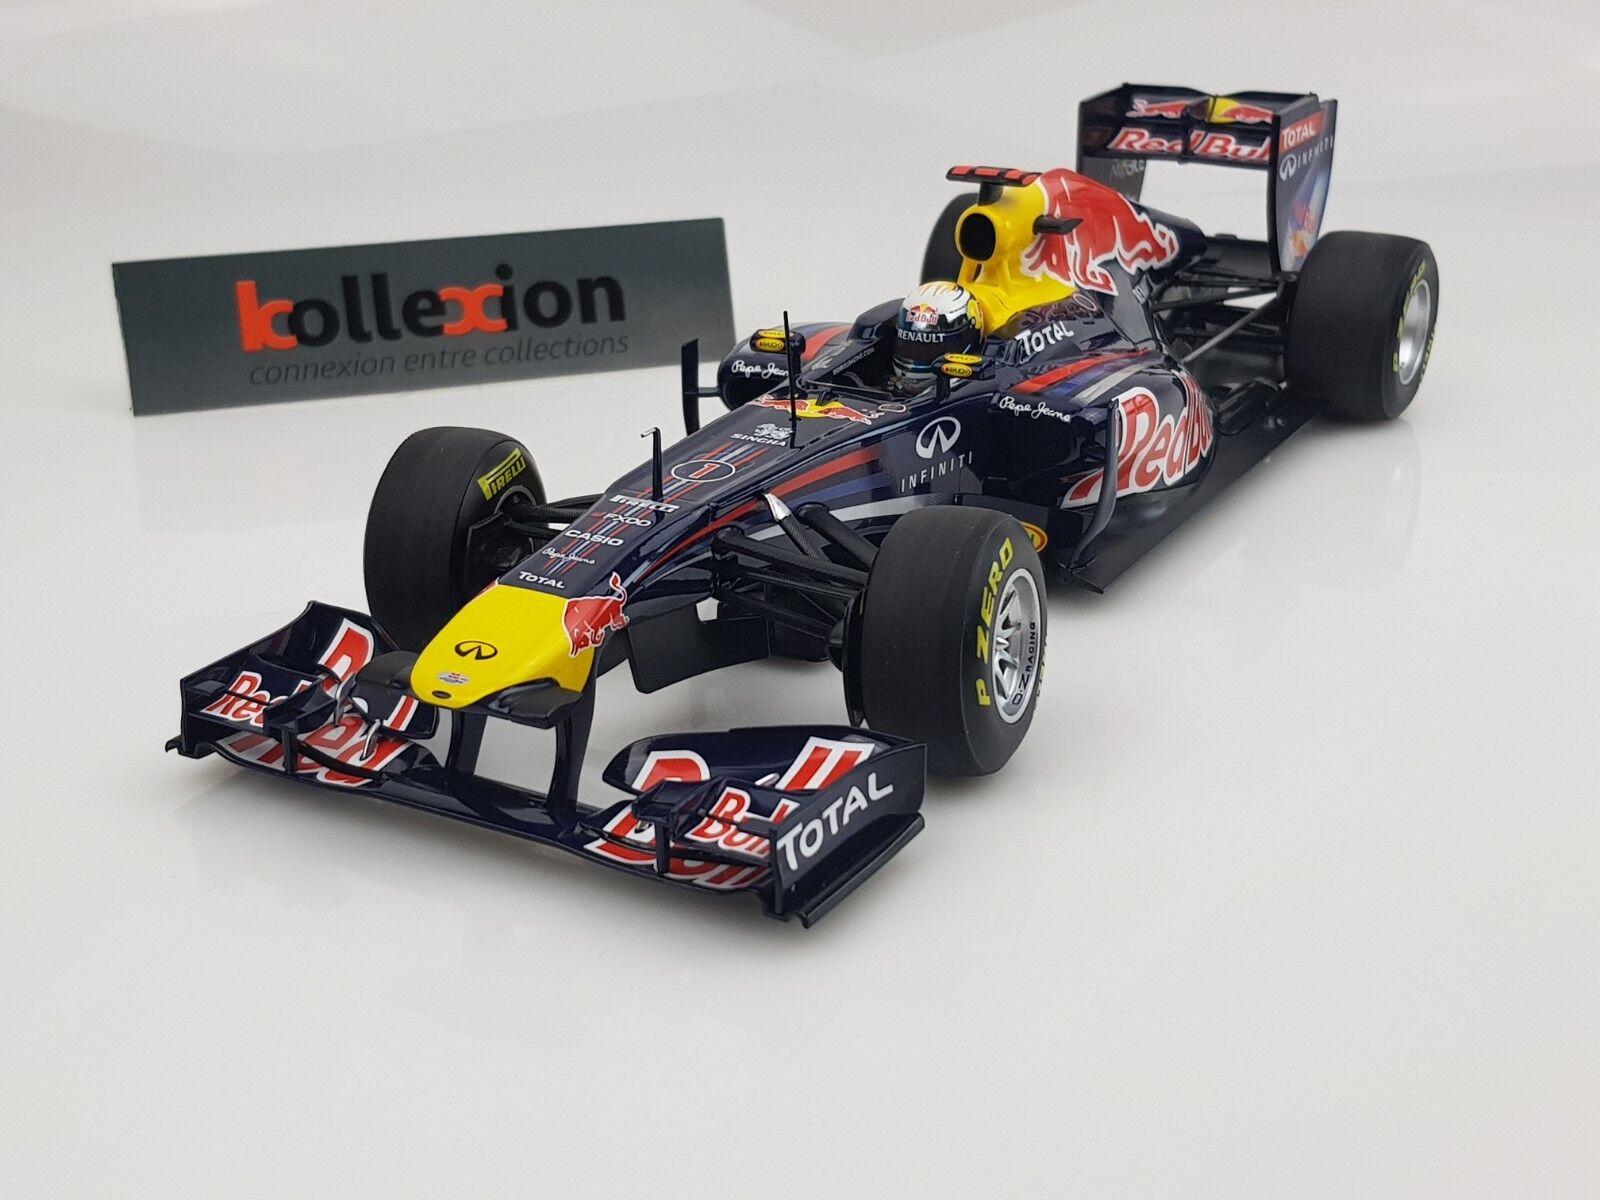 MINICHAMPS 110110001 rouge BULL Racing Renault RB7 S.Vettel 2011 1.18 NB